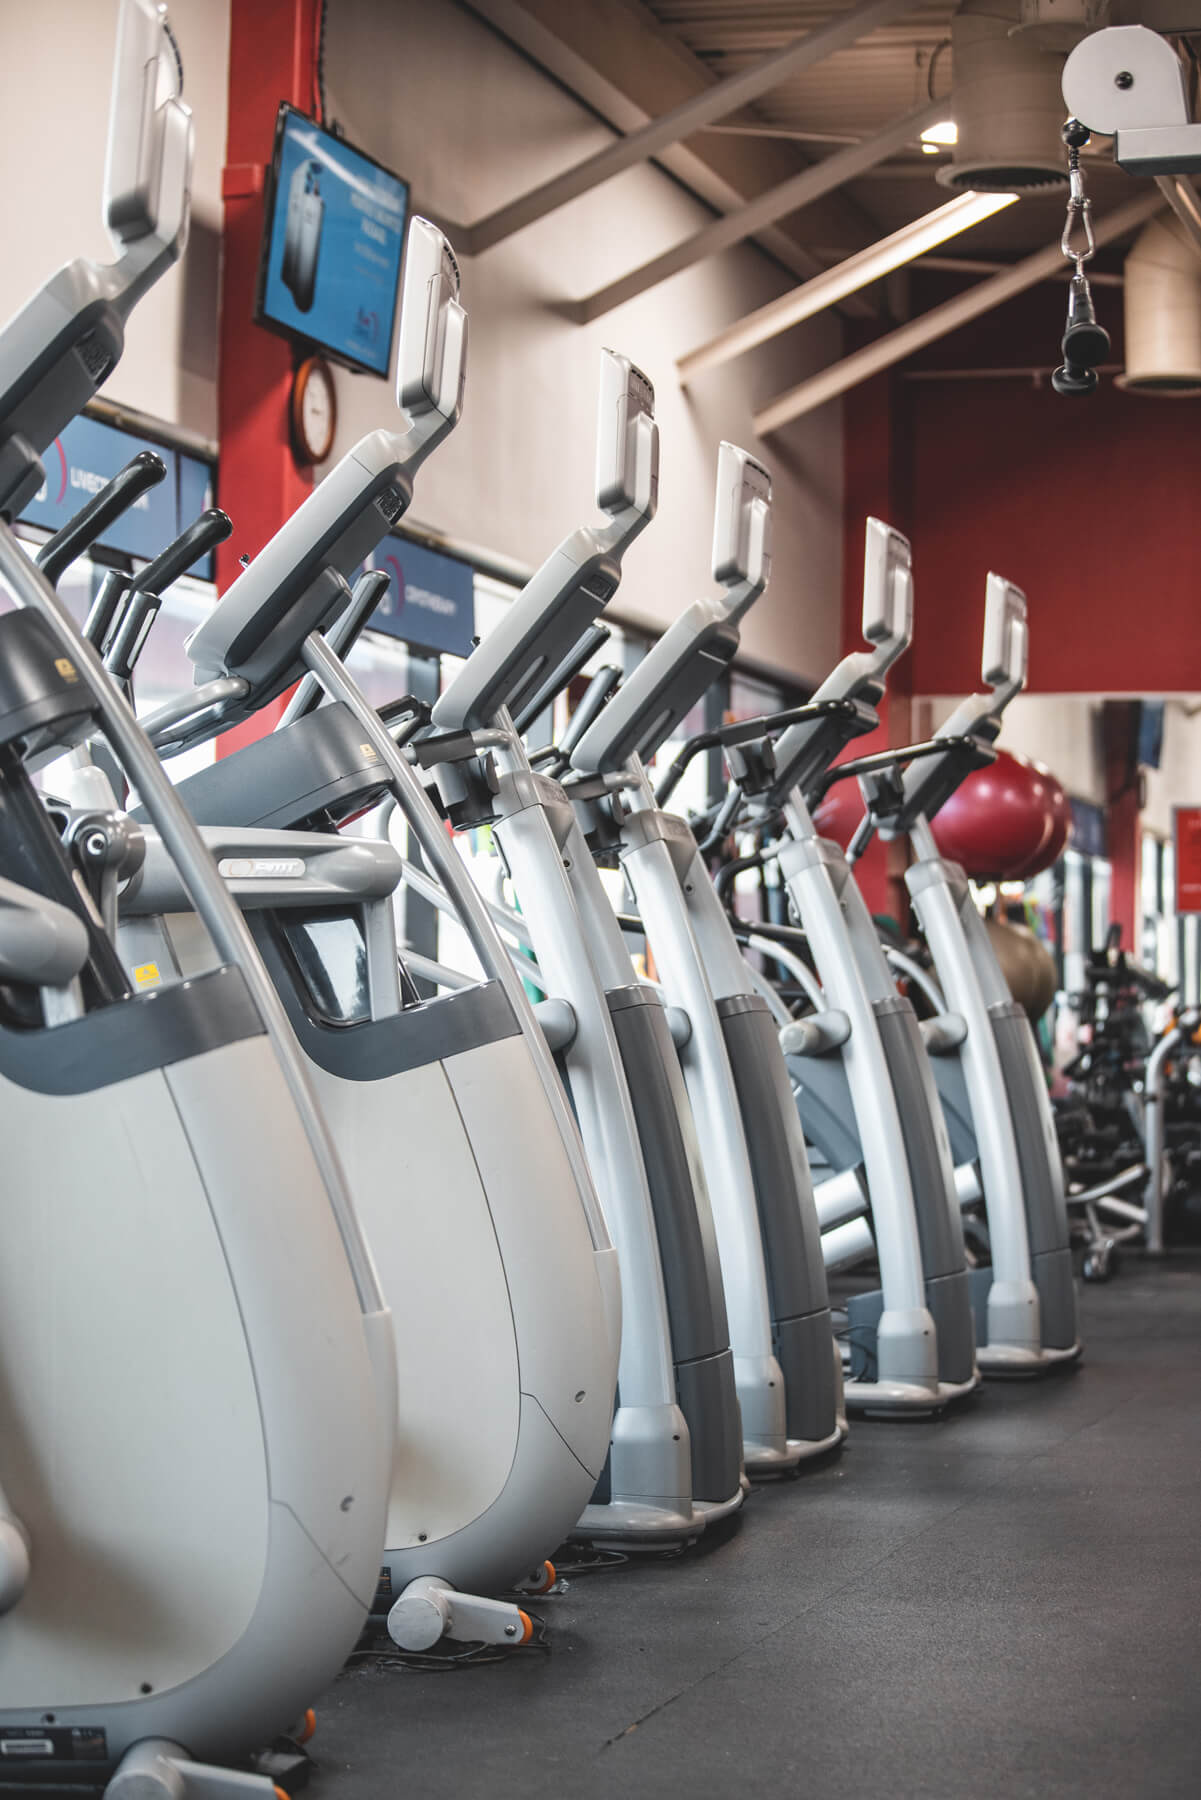 An Image of the Troy, MI Powerhouse Gym Location